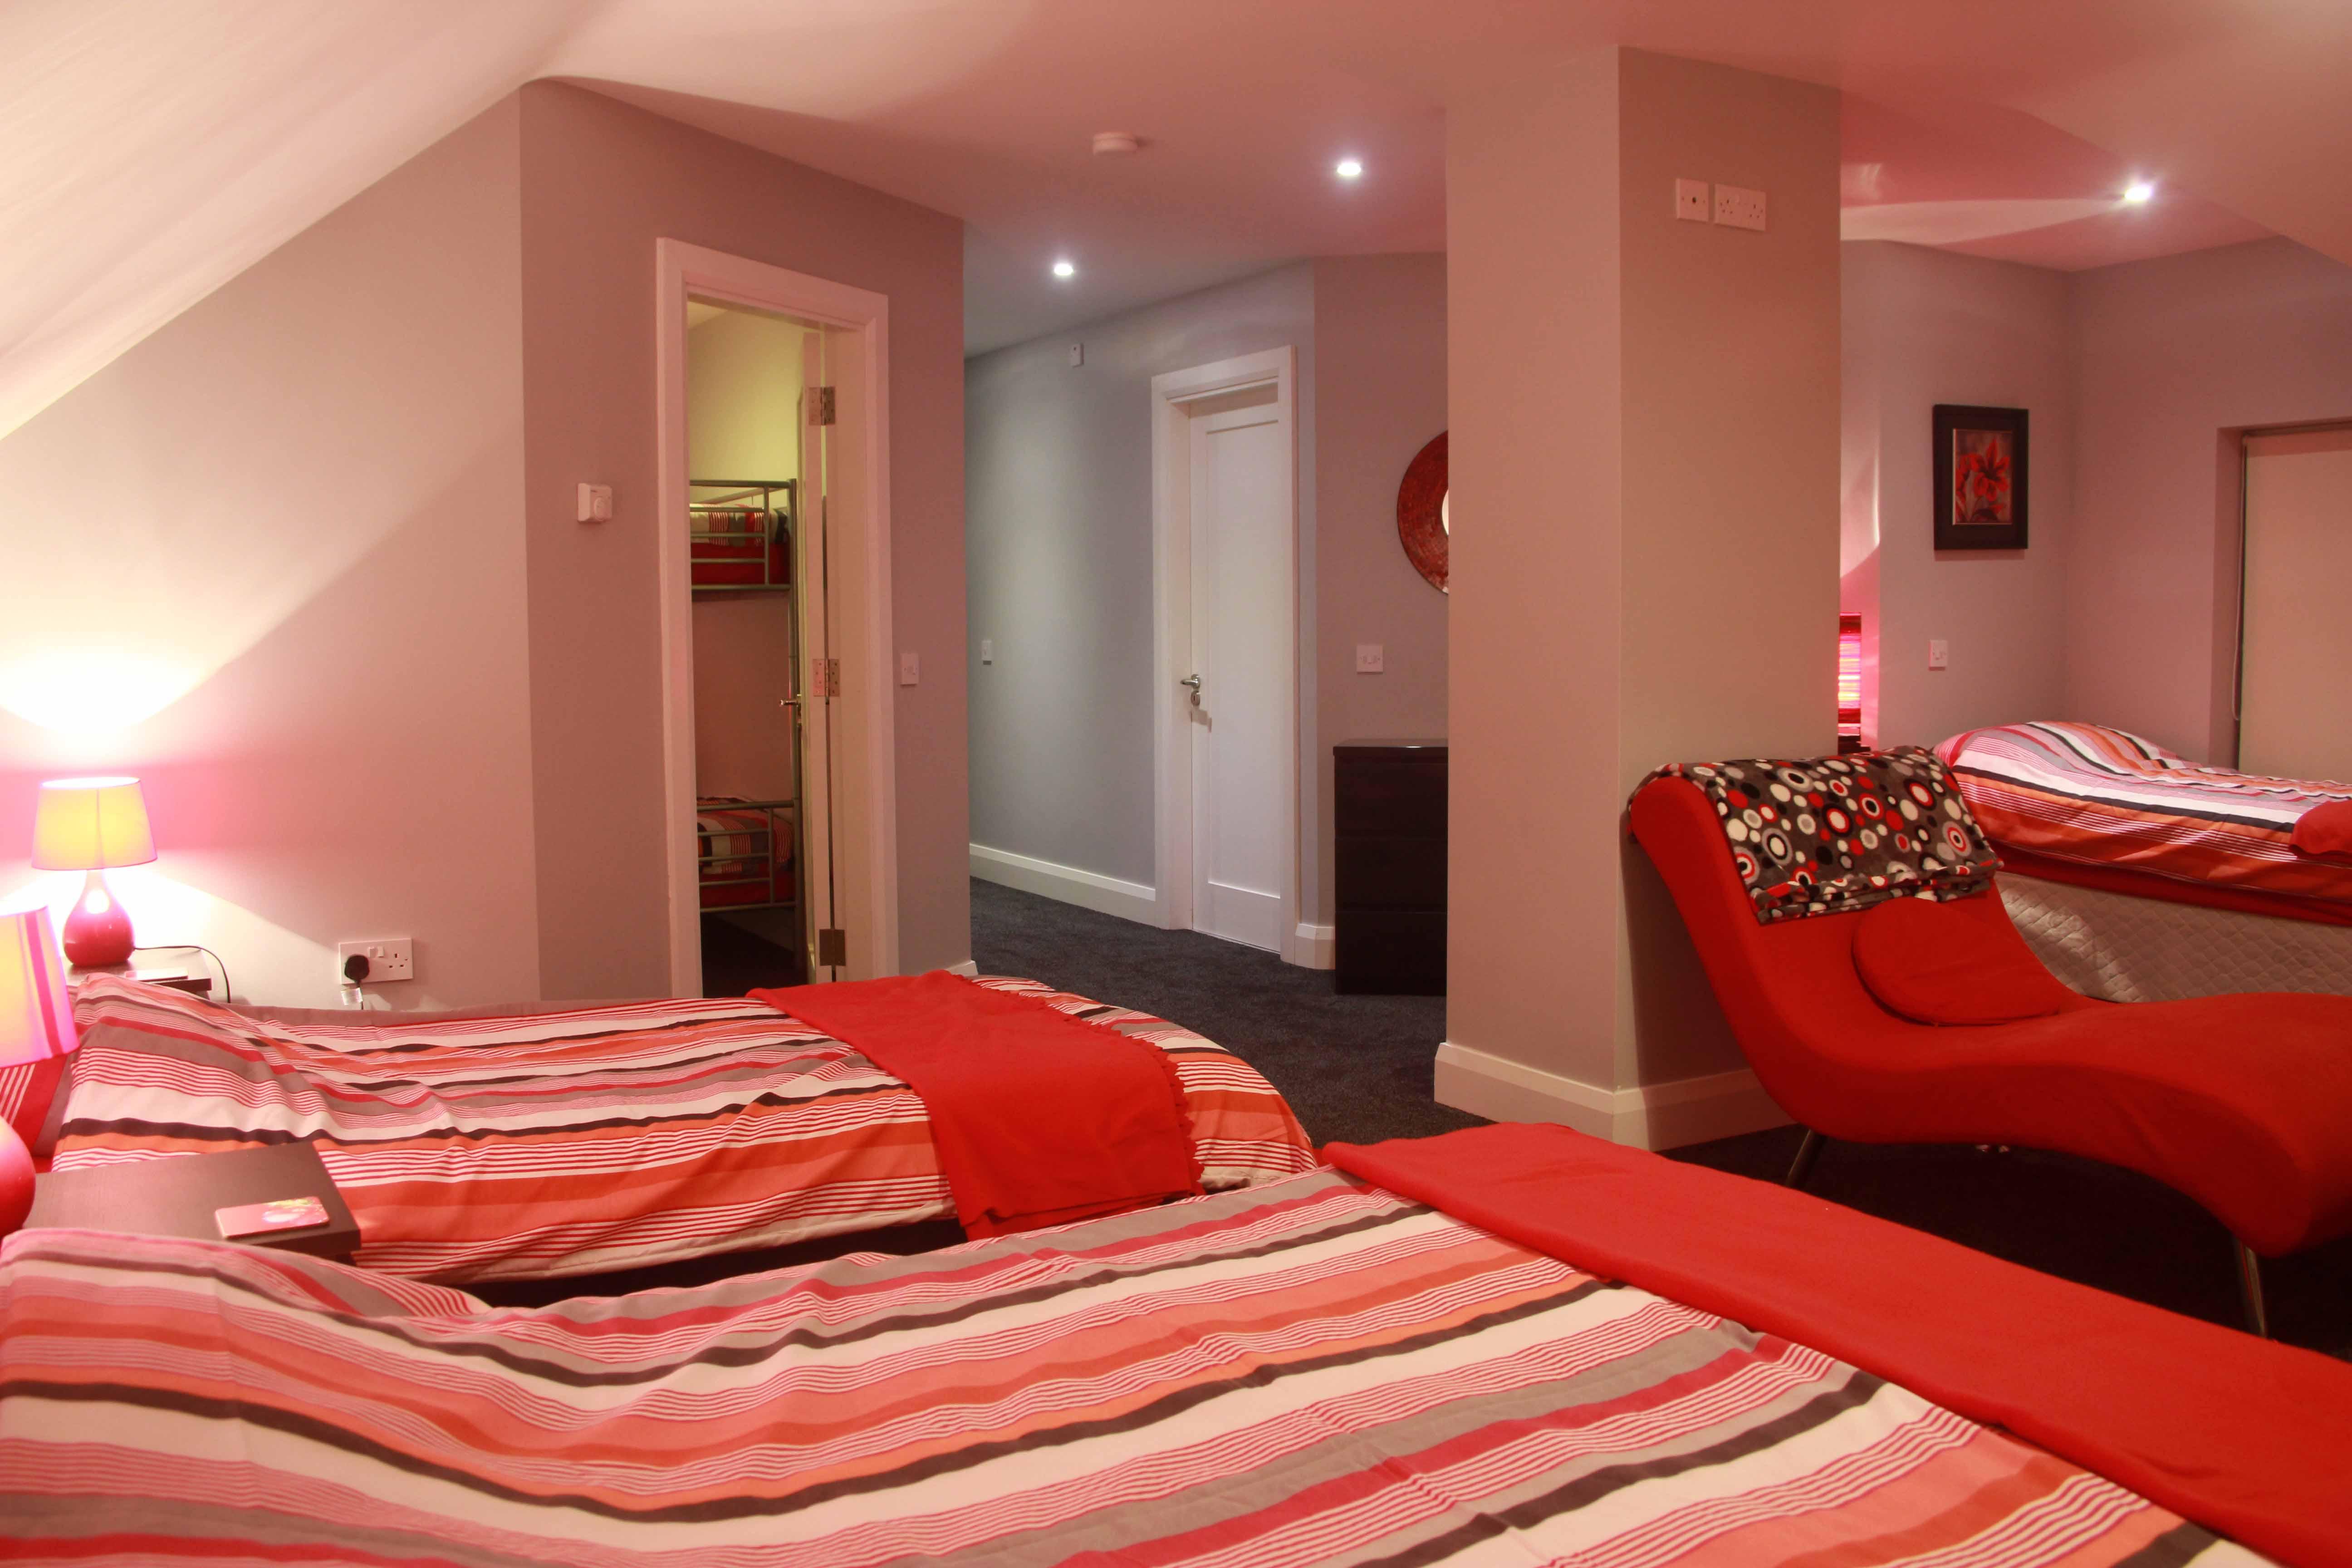 The Red Room – Family Room | Sanibel B&B